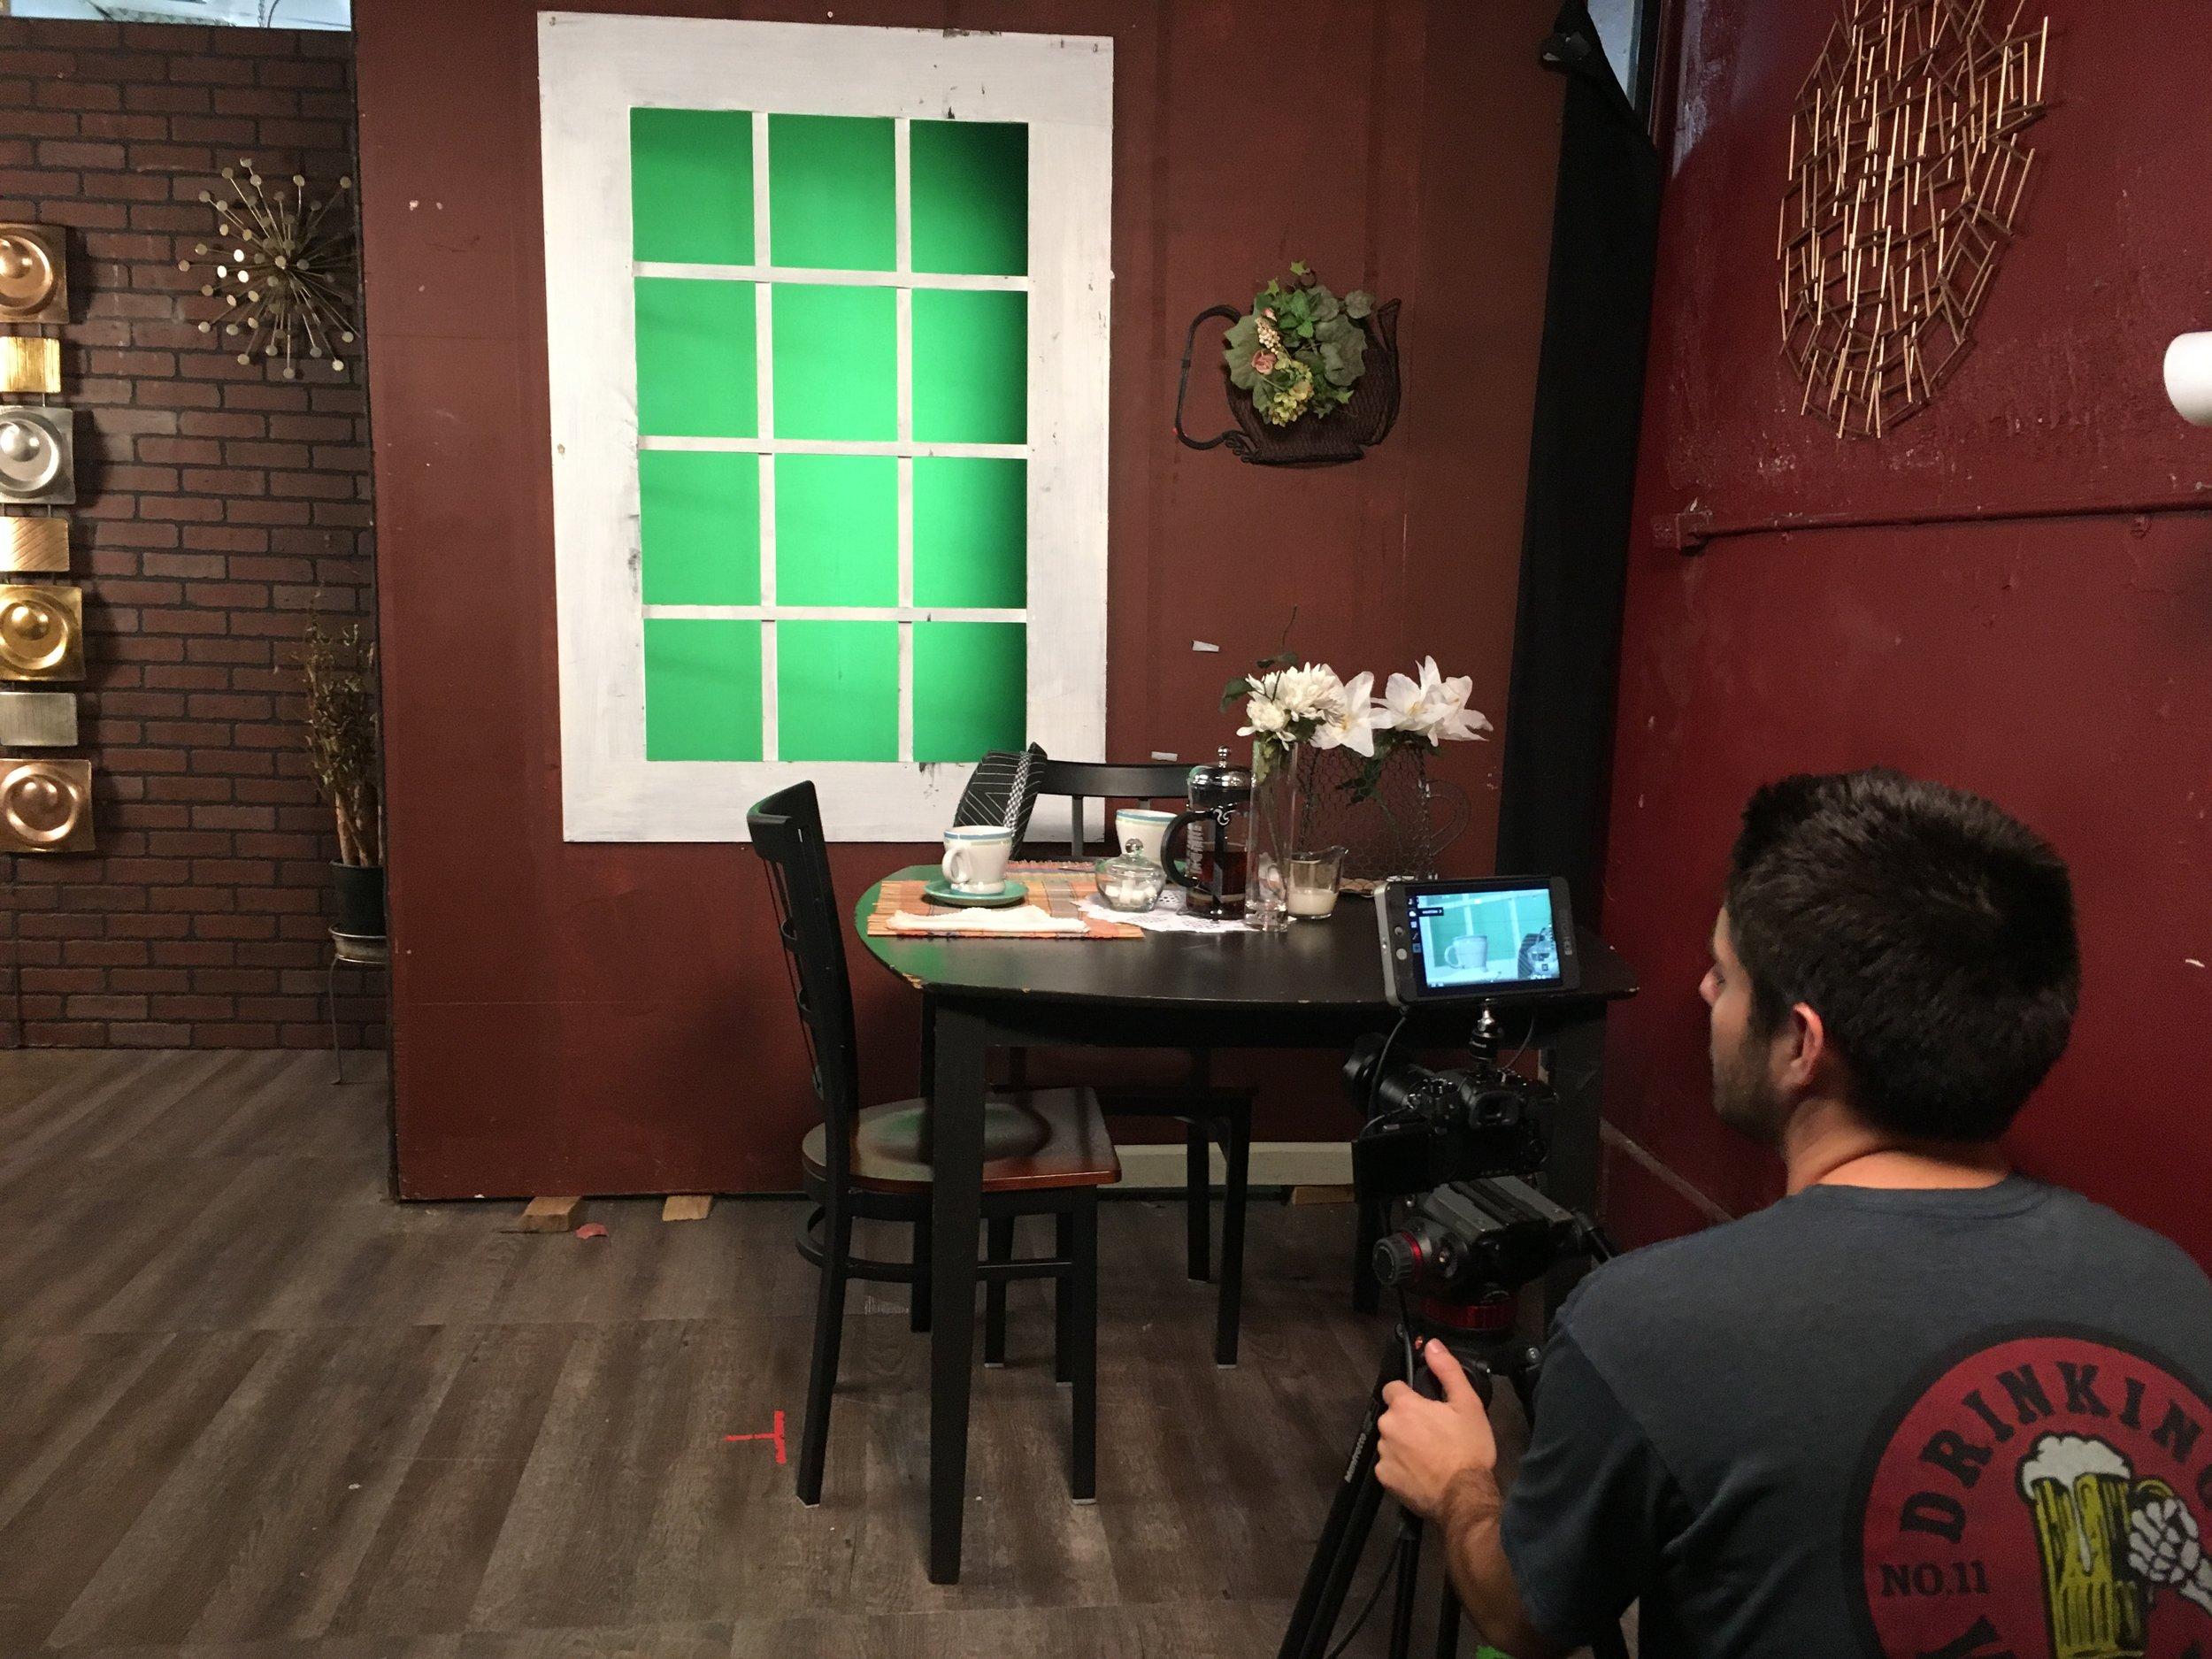 We shot a green screen